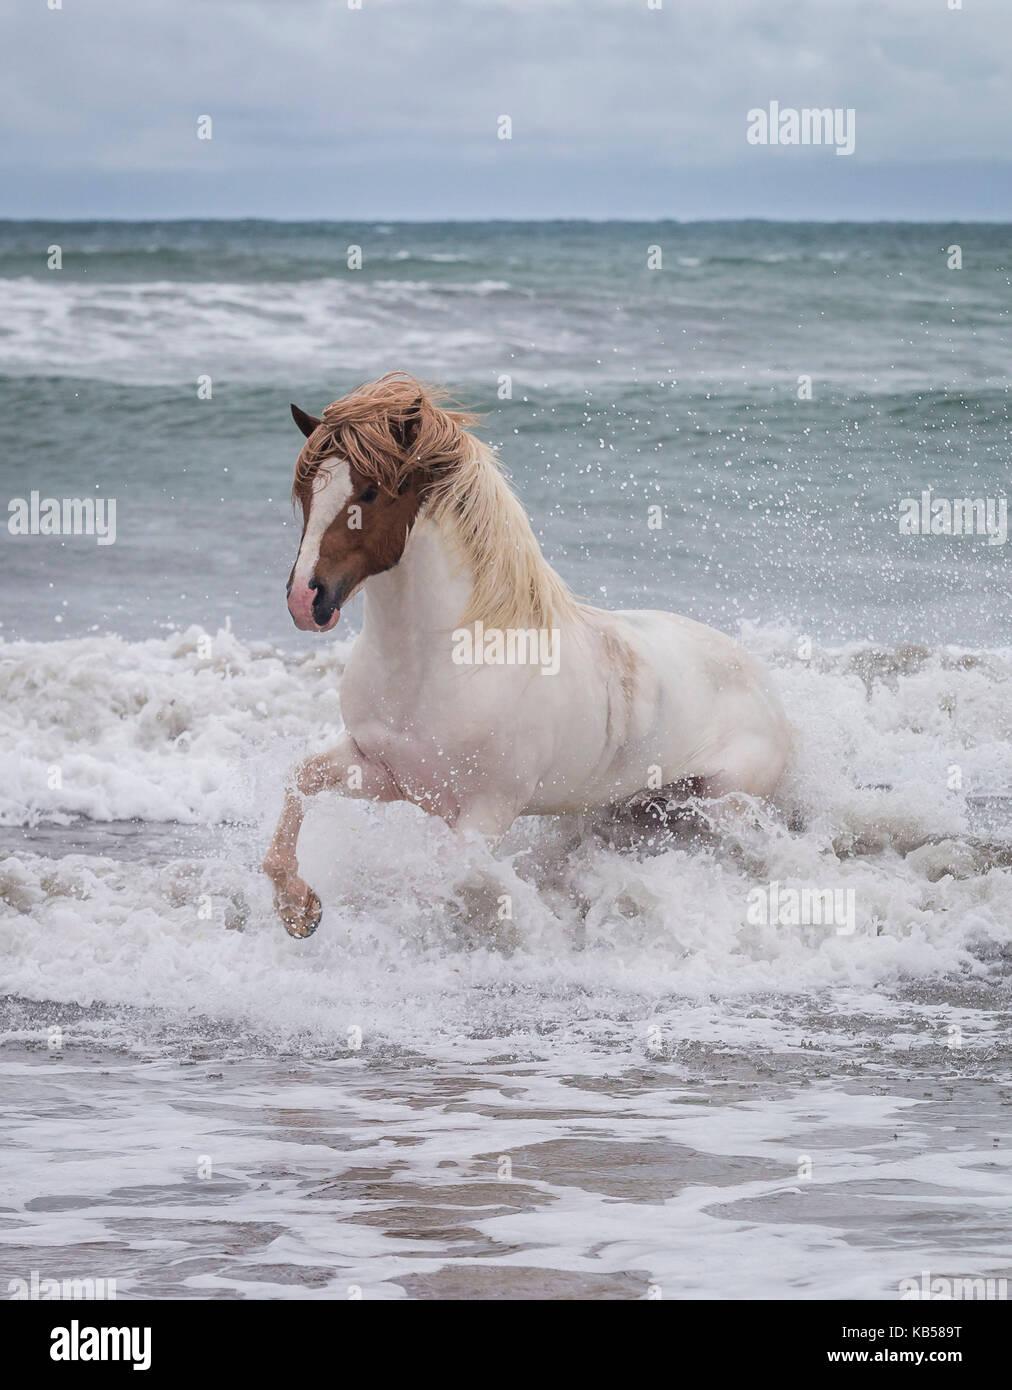 Icelandic horse in the sea, Longufjorur Beach, Snaefellsnes Peninsula, Iceland - Stock Image